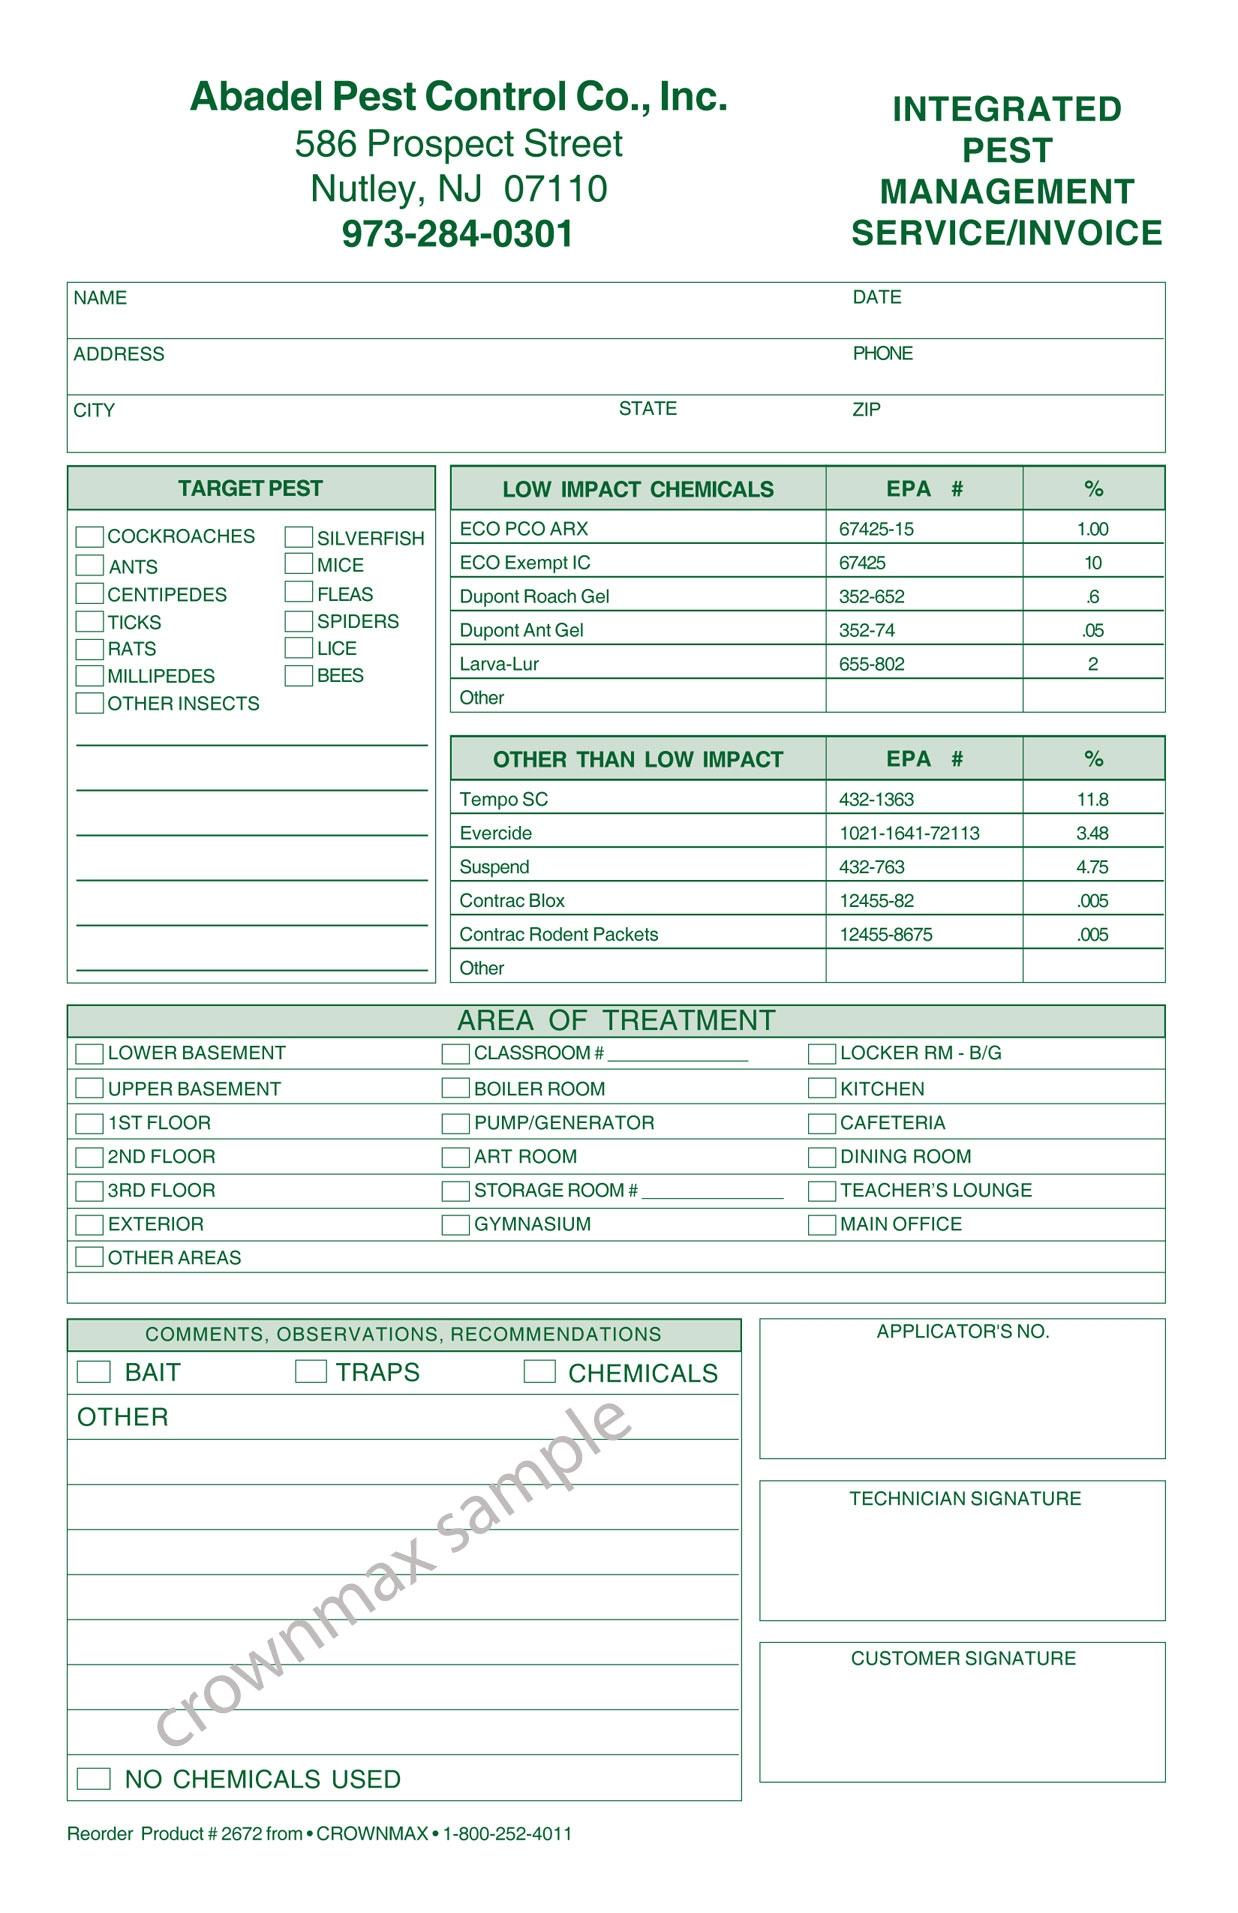 pest control invoice software pest control invoice invoic pest pest control invoices